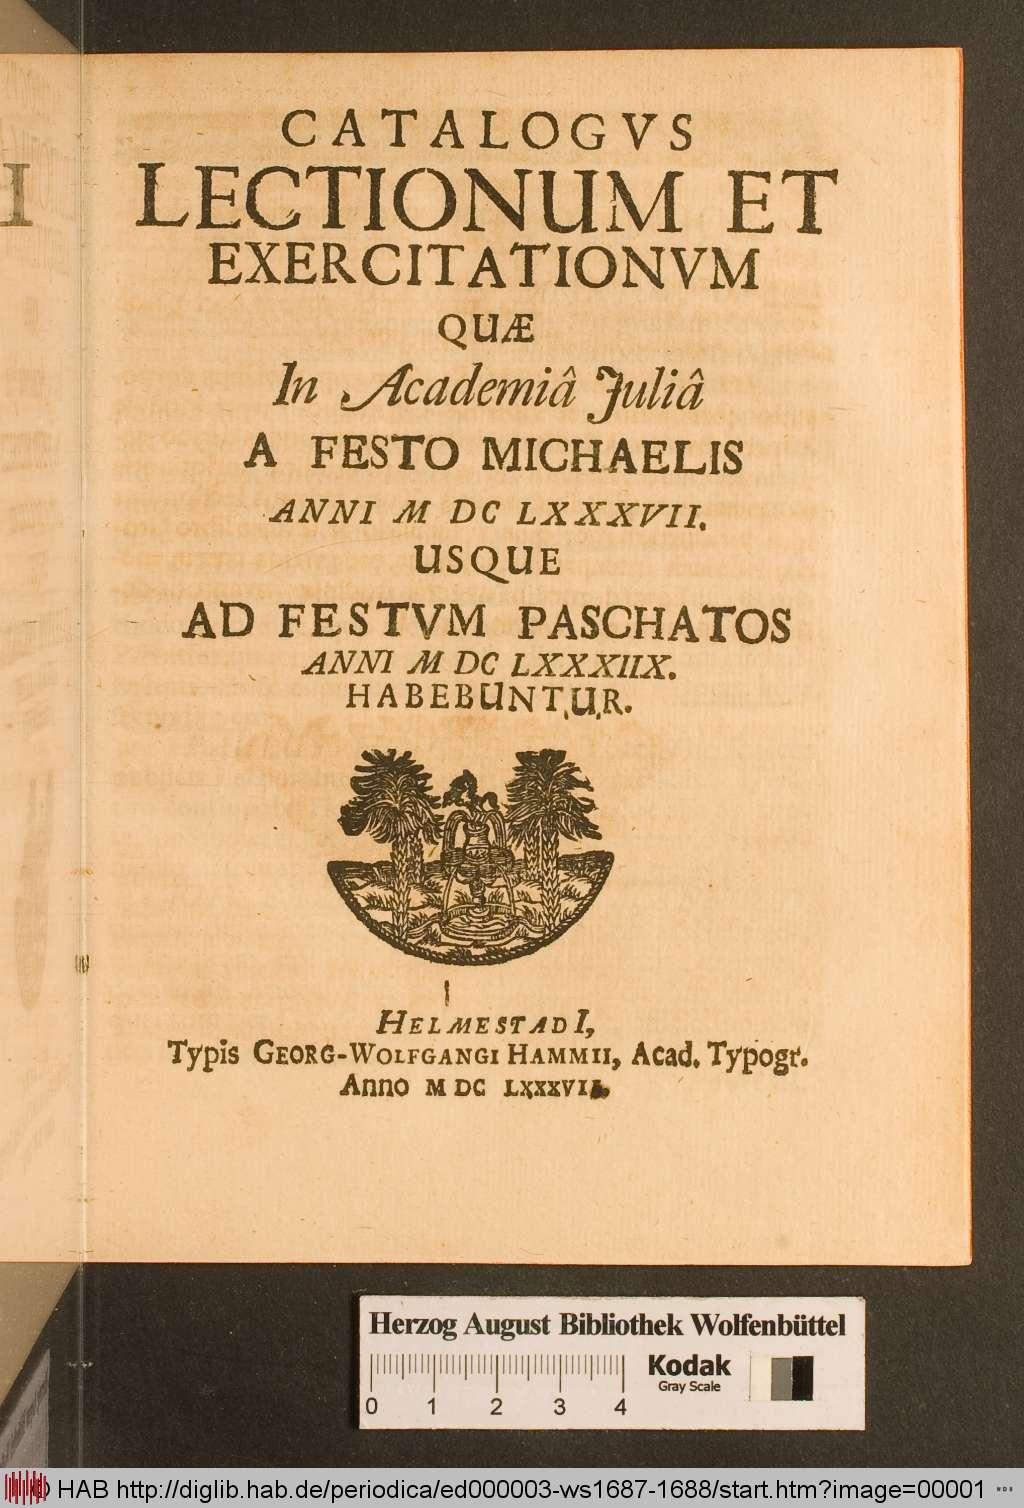 http://diglib.hab.de/periodica/ed000003-ws1687-1688/00001.jpg